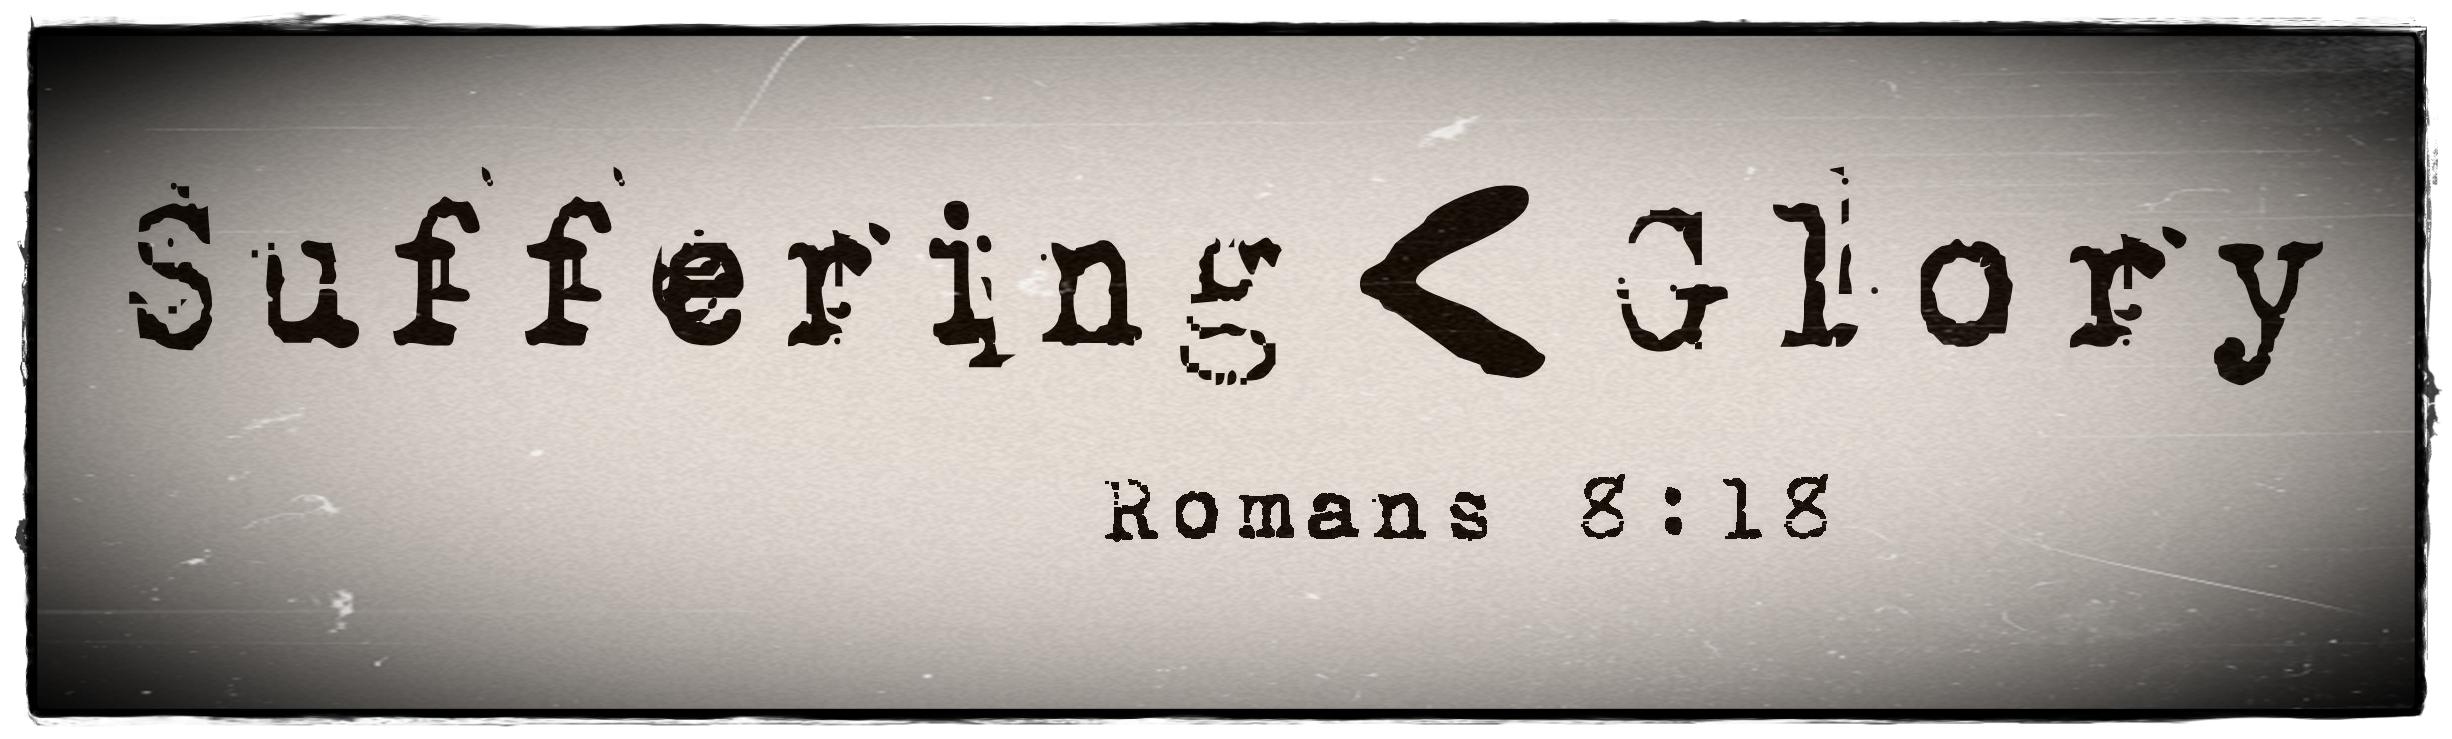 20 July 2014 - Romans 8:18-25 - Holy Cross Lutheran Church